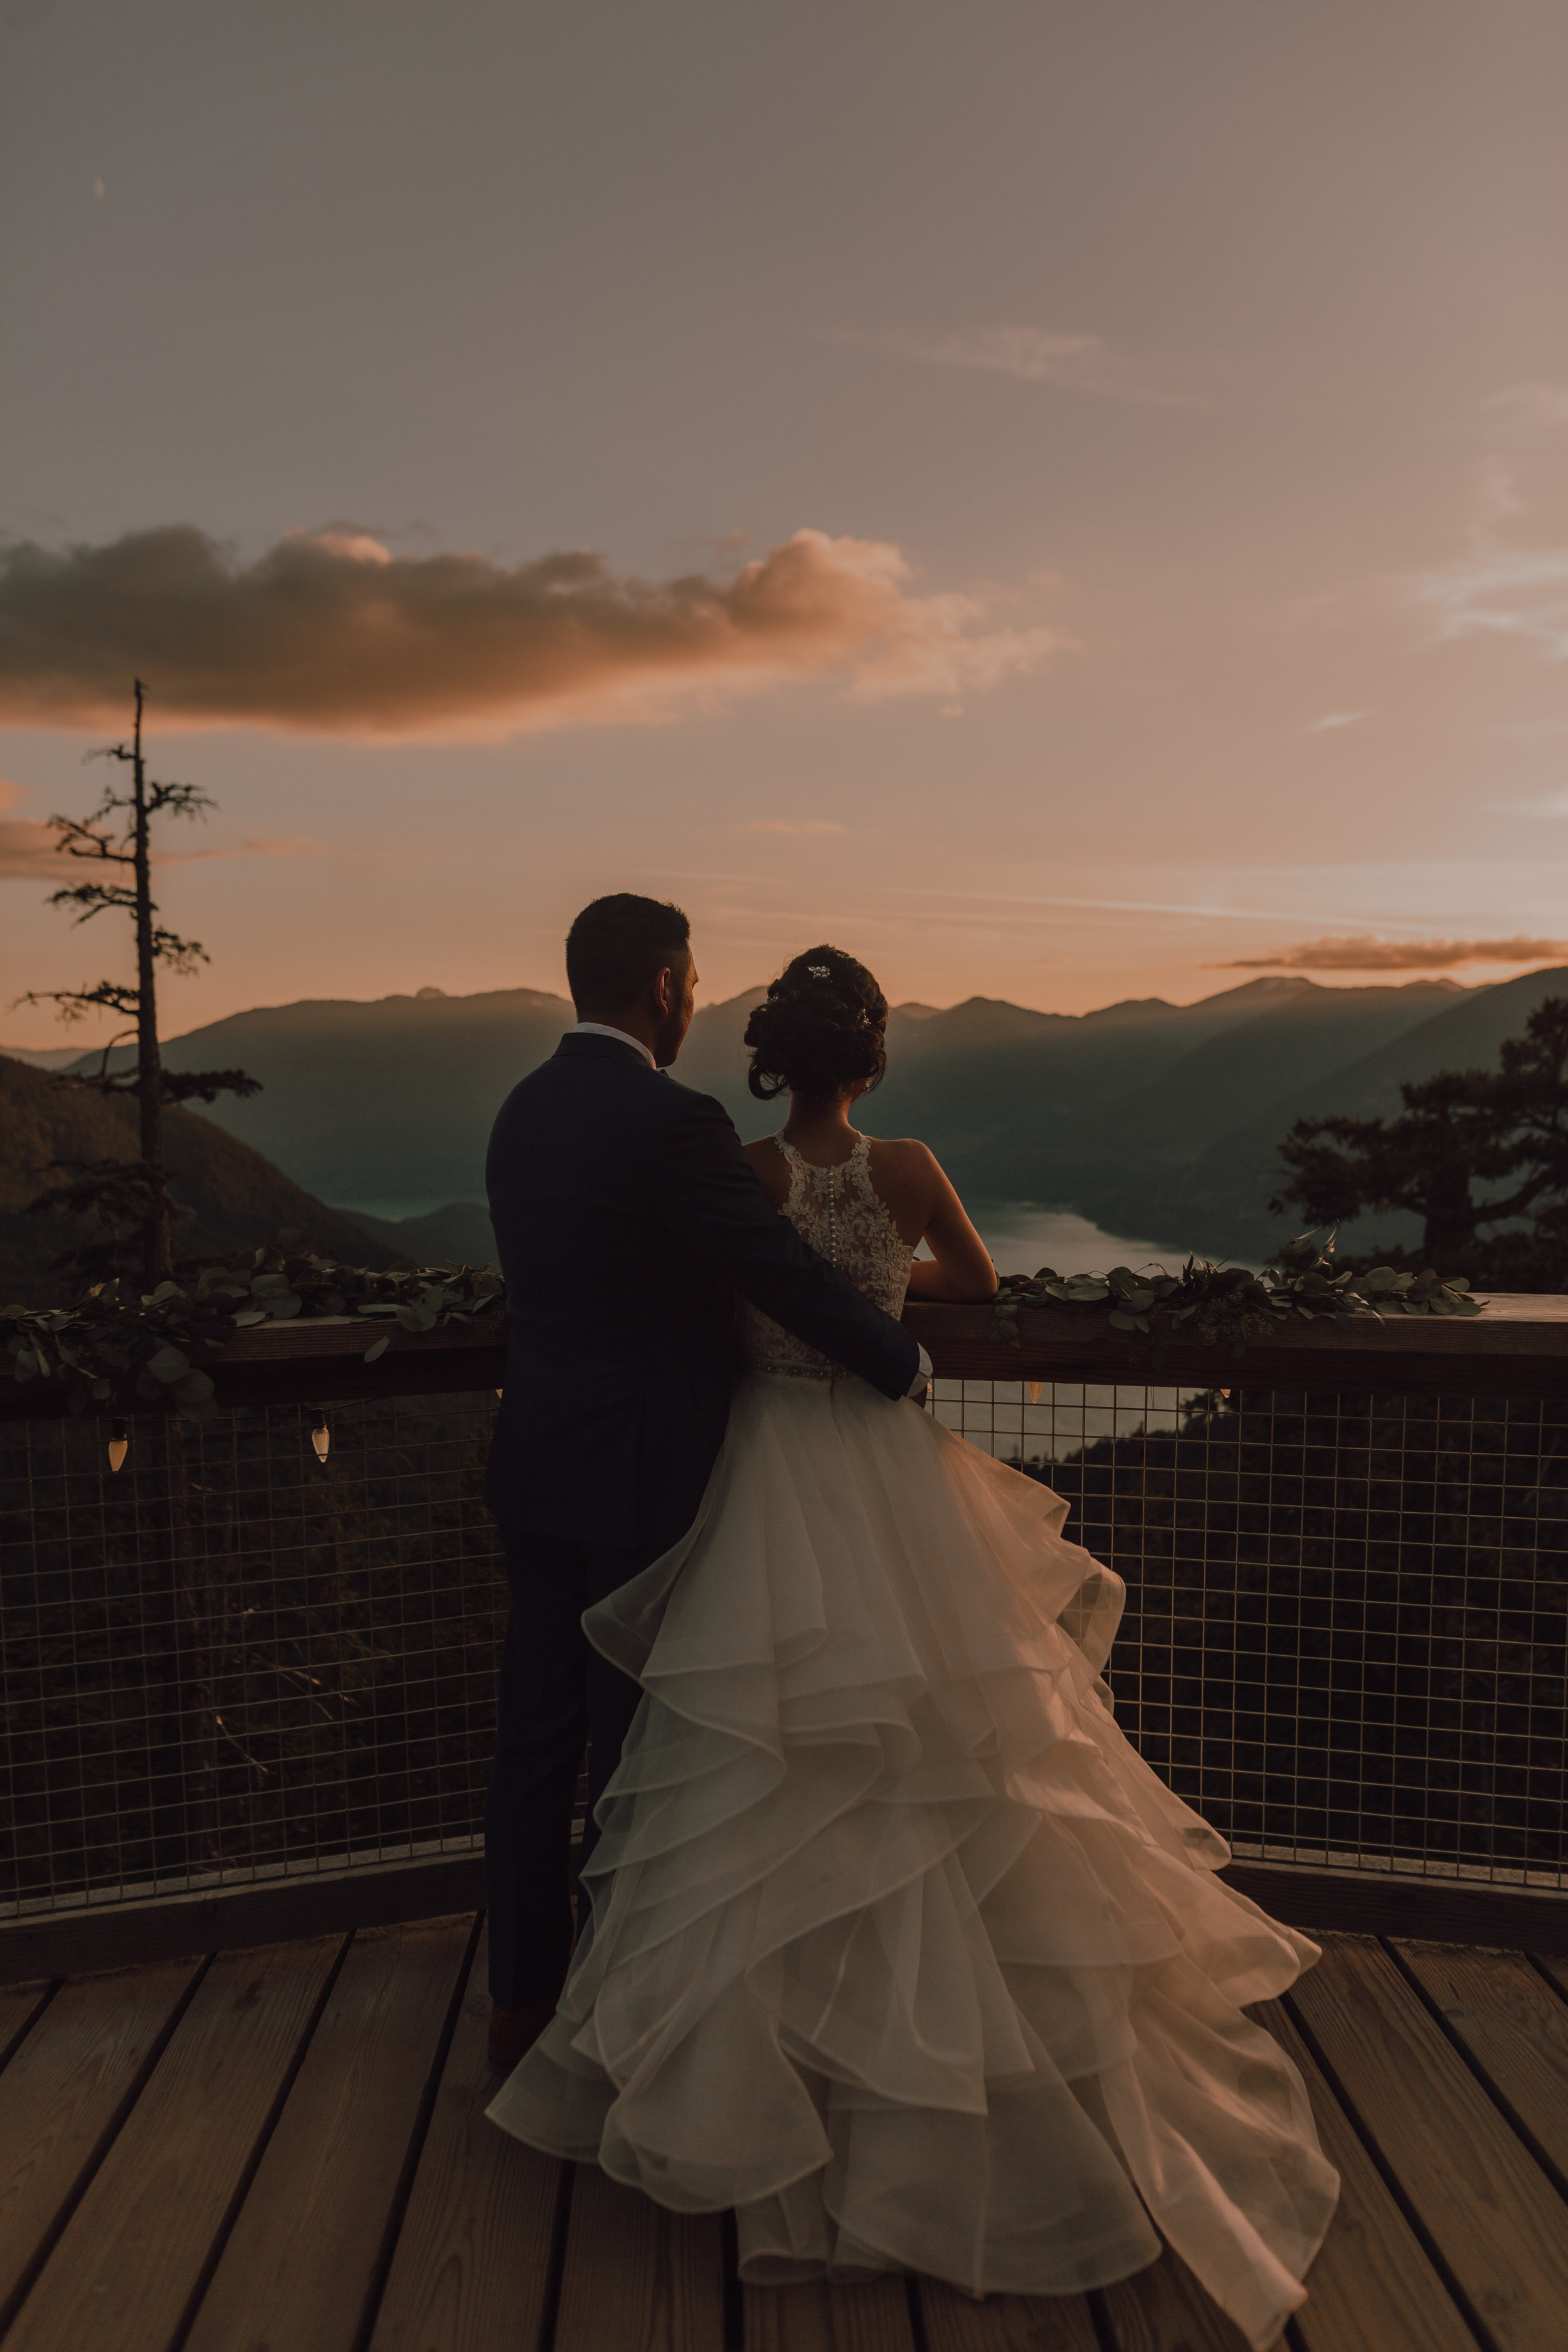 Squamish Wedding Photographer - Sea to Sky Gondola Wedding Photos -  Vancouver Wedding Photographer & Videographer - Sunshine Coast Wedding Photos - Sunshine Coast Wedding Photographer - Jennifer Picard Photography - IMG_5218.jpg